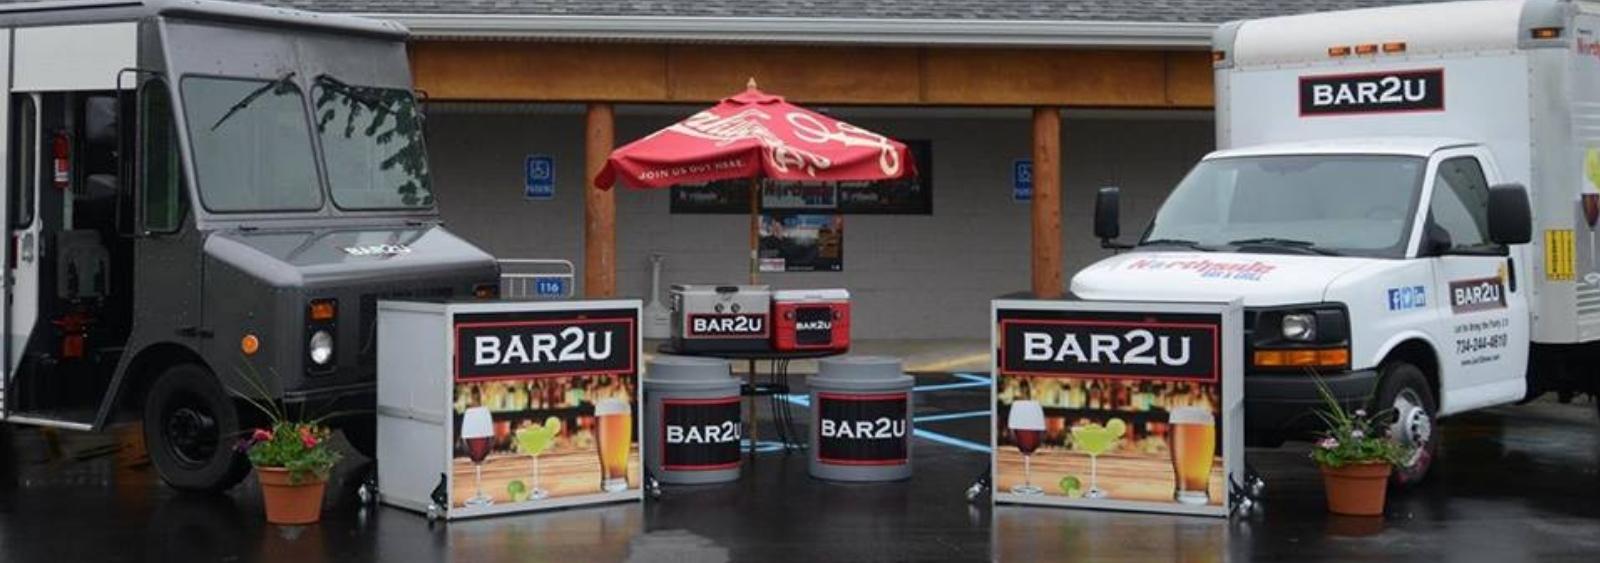 Bar2U  (bar catering)